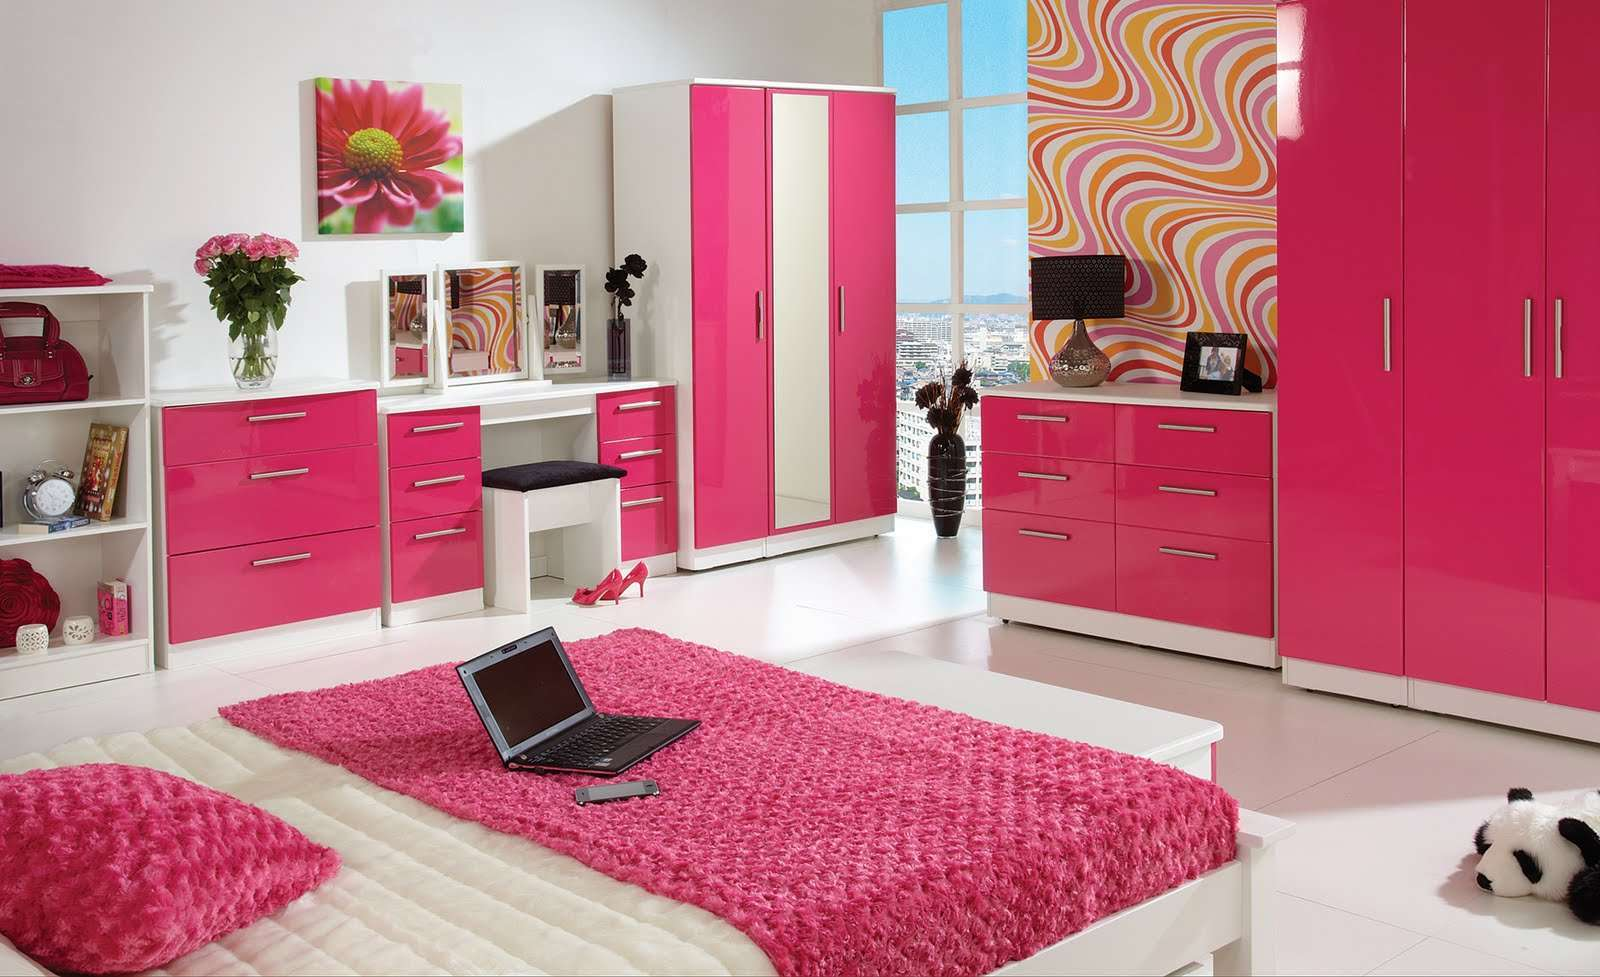 بالصور غرف اطفال بنات , صور تصميمات غرف لارق واجمل بنوته 3640 6